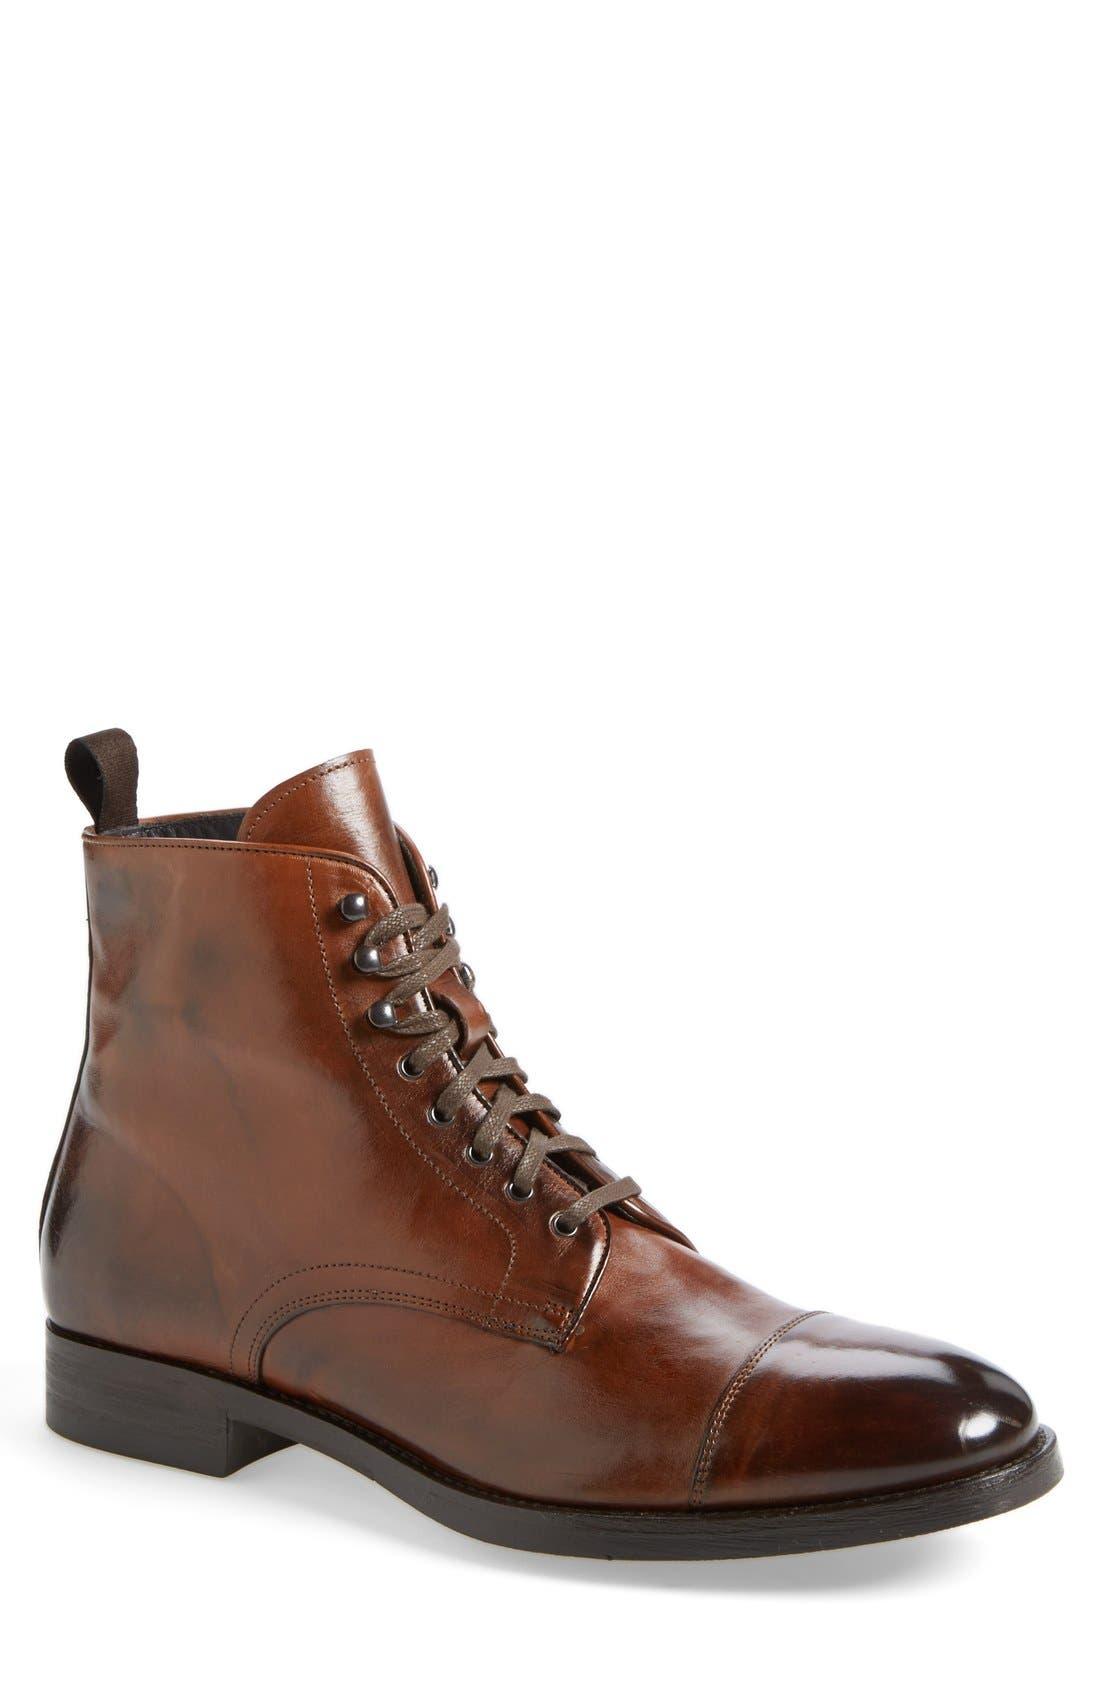 Main Image - To Boot New York 'Stallworth' Cap Toe Boot (Men)